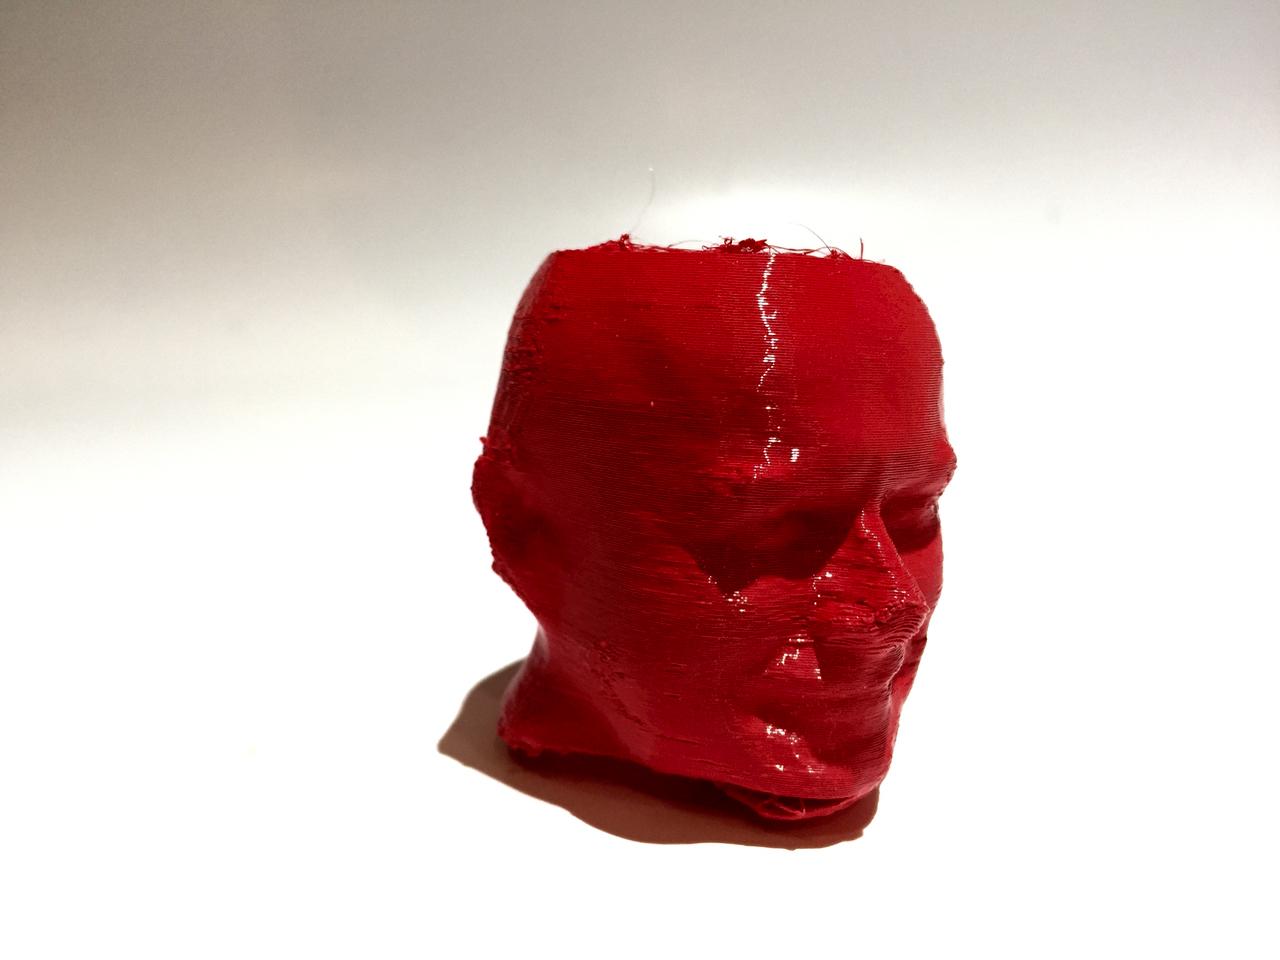 Another Robert Head 3D printed with Fiberlogy's FiberFlex 40D filament